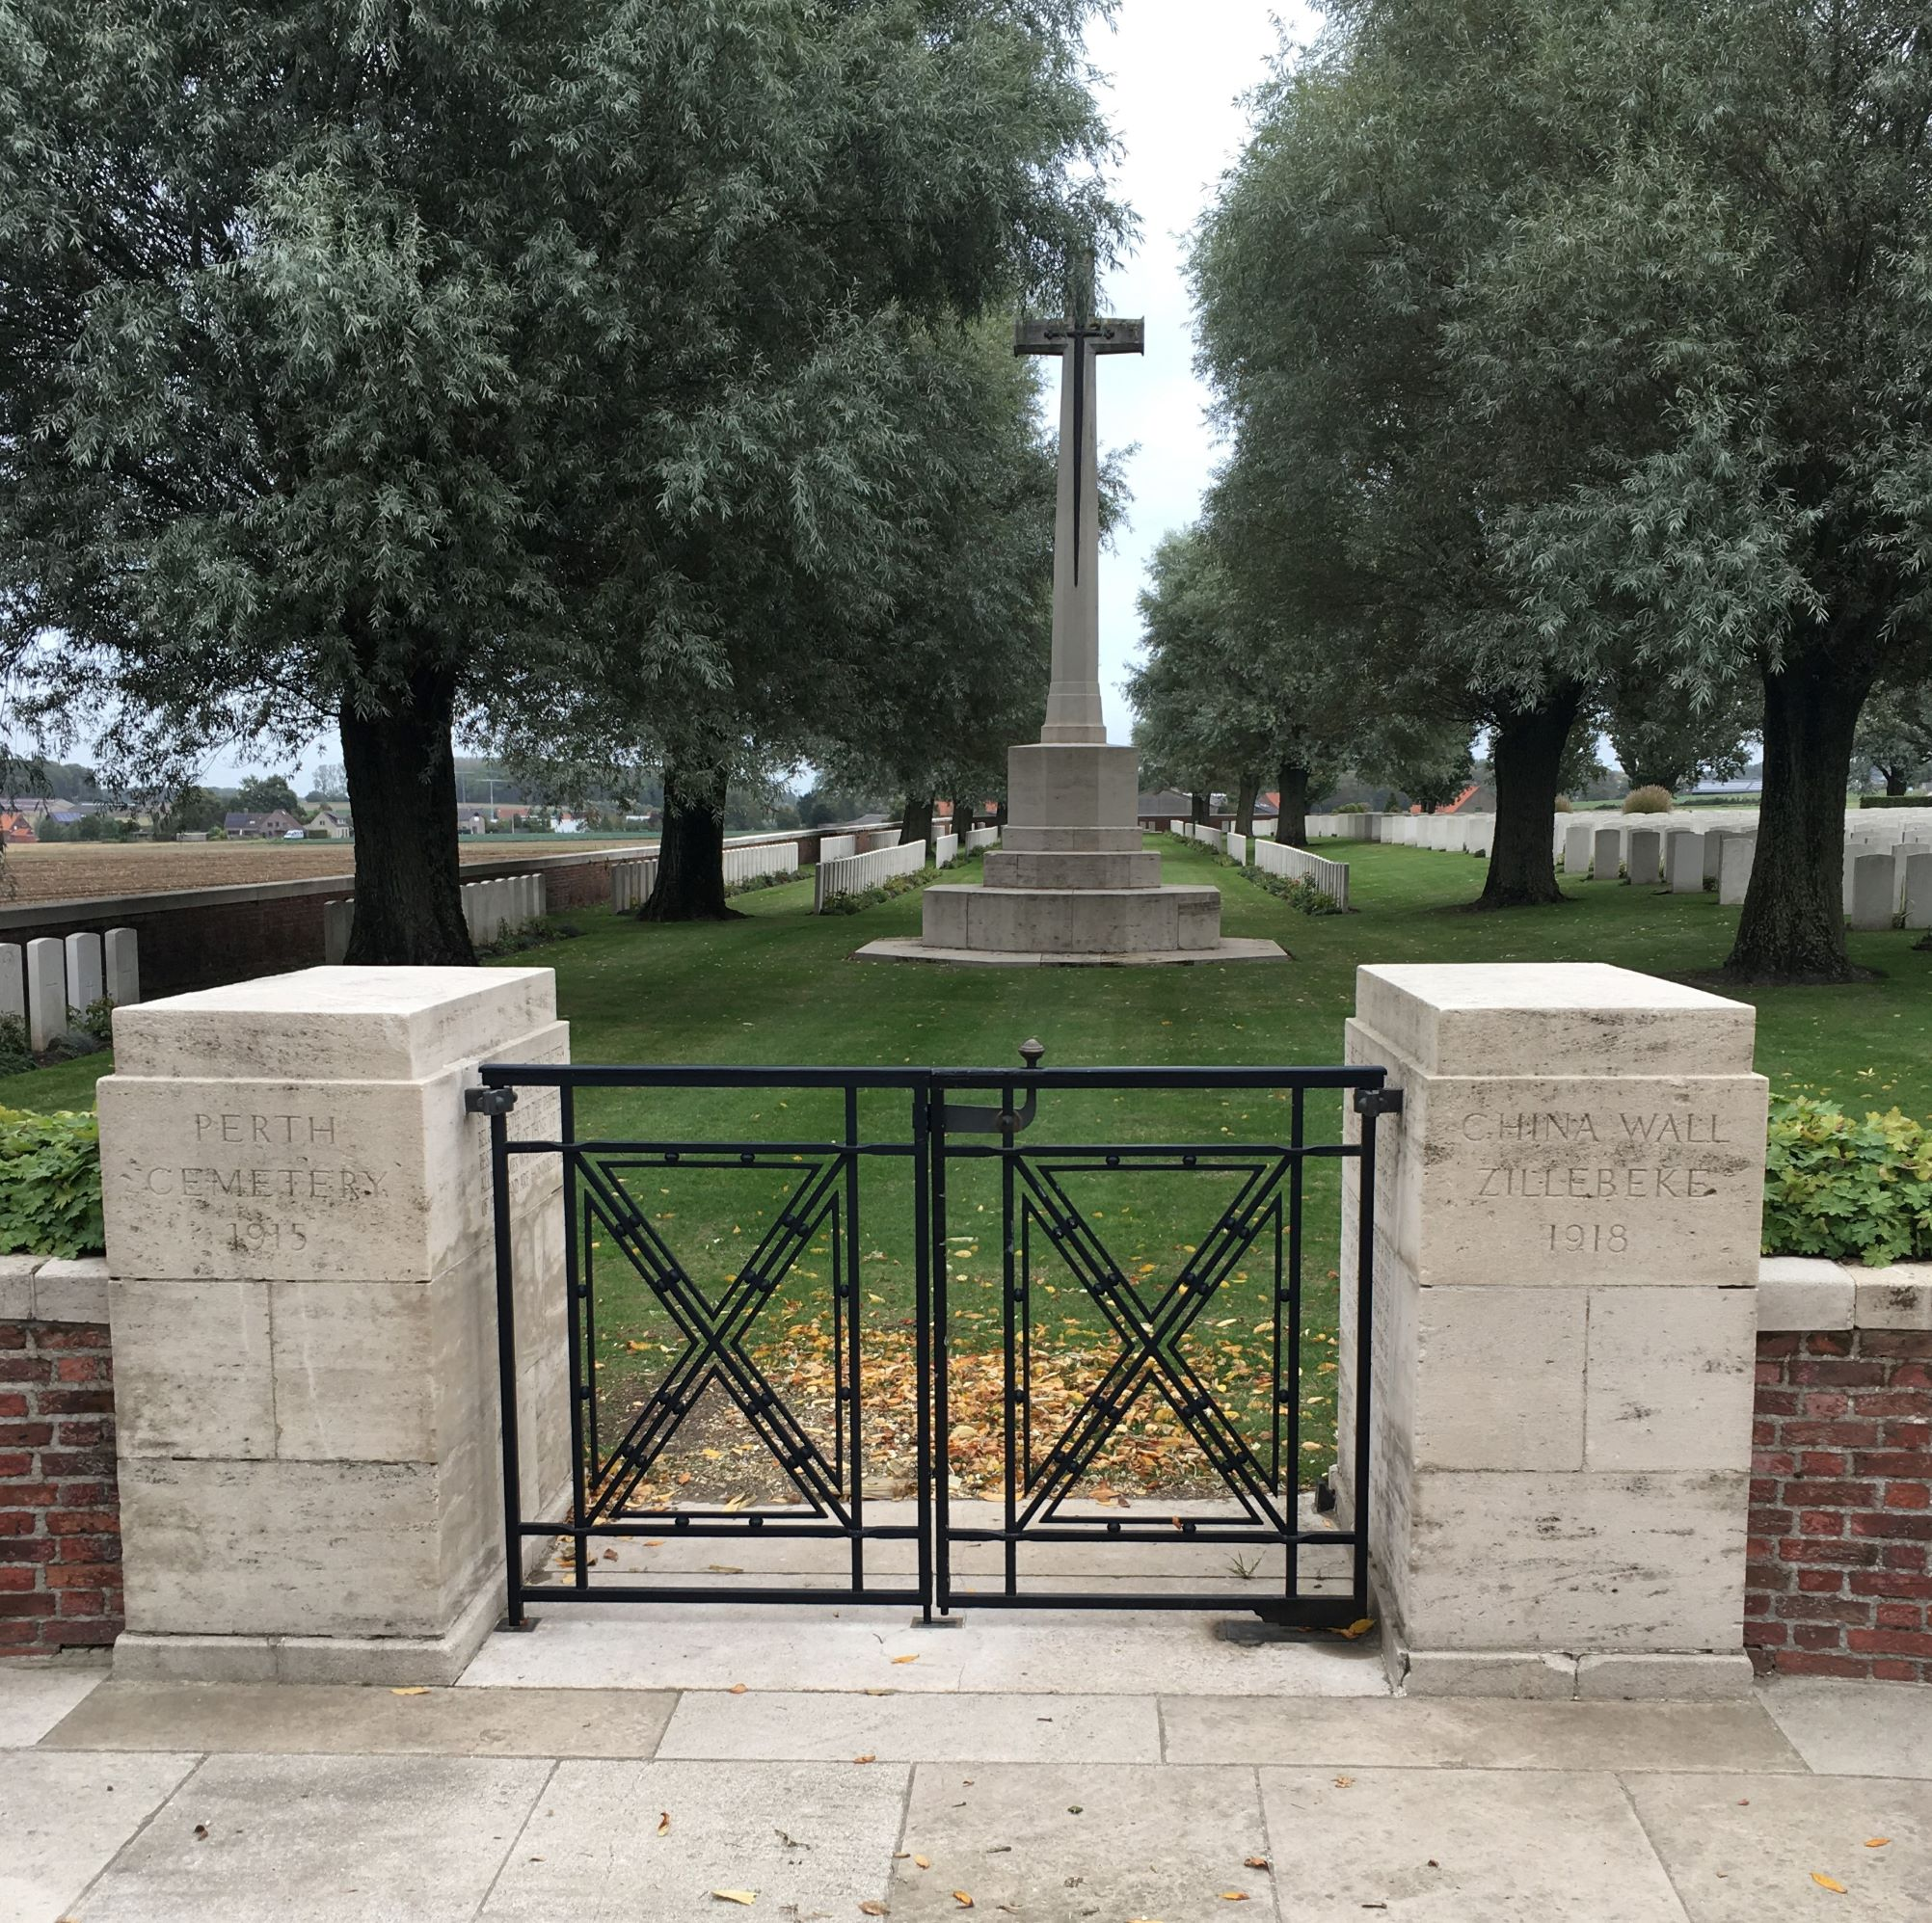 Perth Cemetery Gates